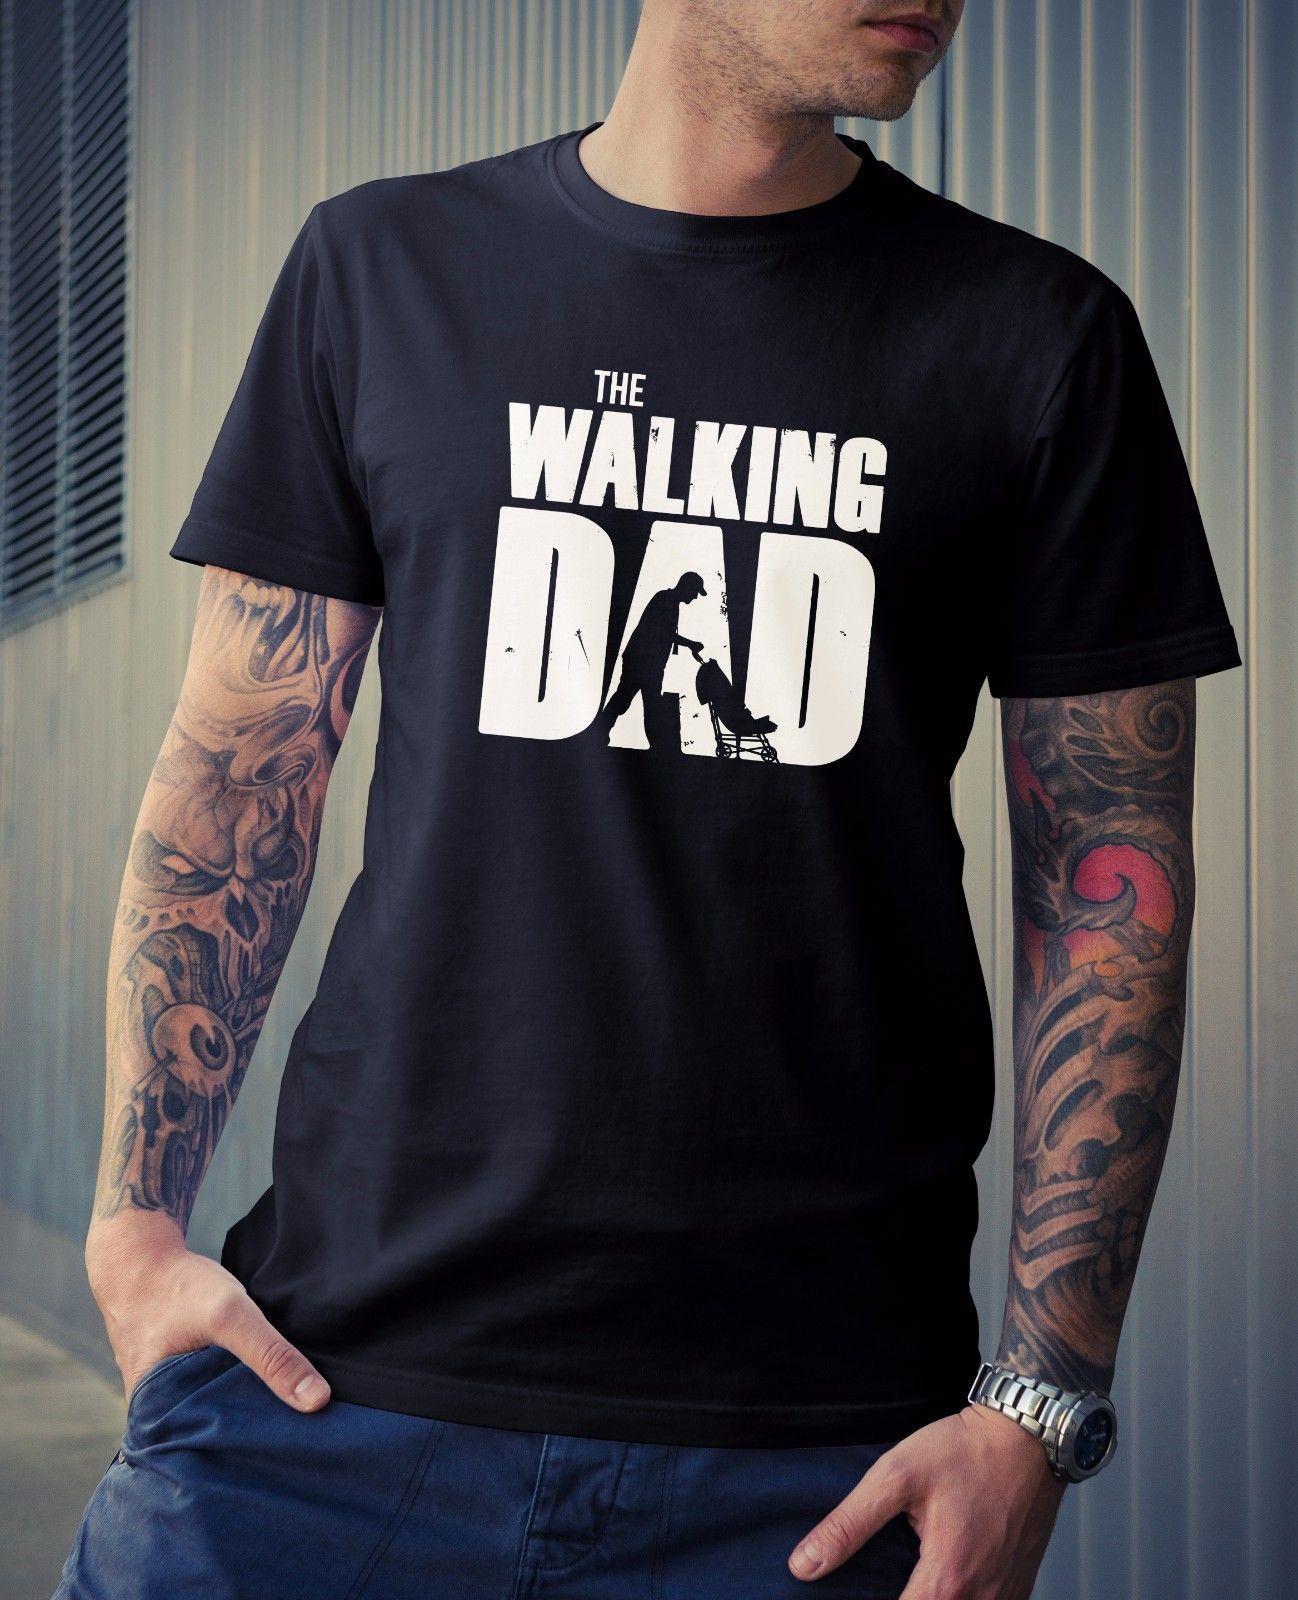 a3e33496e2a5 Walking Dad Mens Tee Novelty Gift TV Dead Zombie Joke Funny TWD Fathers  Geek Cool Casual Pride T Shirt Men Unisex Fashion Tshirt As T Shirt Online T  Shirts ...